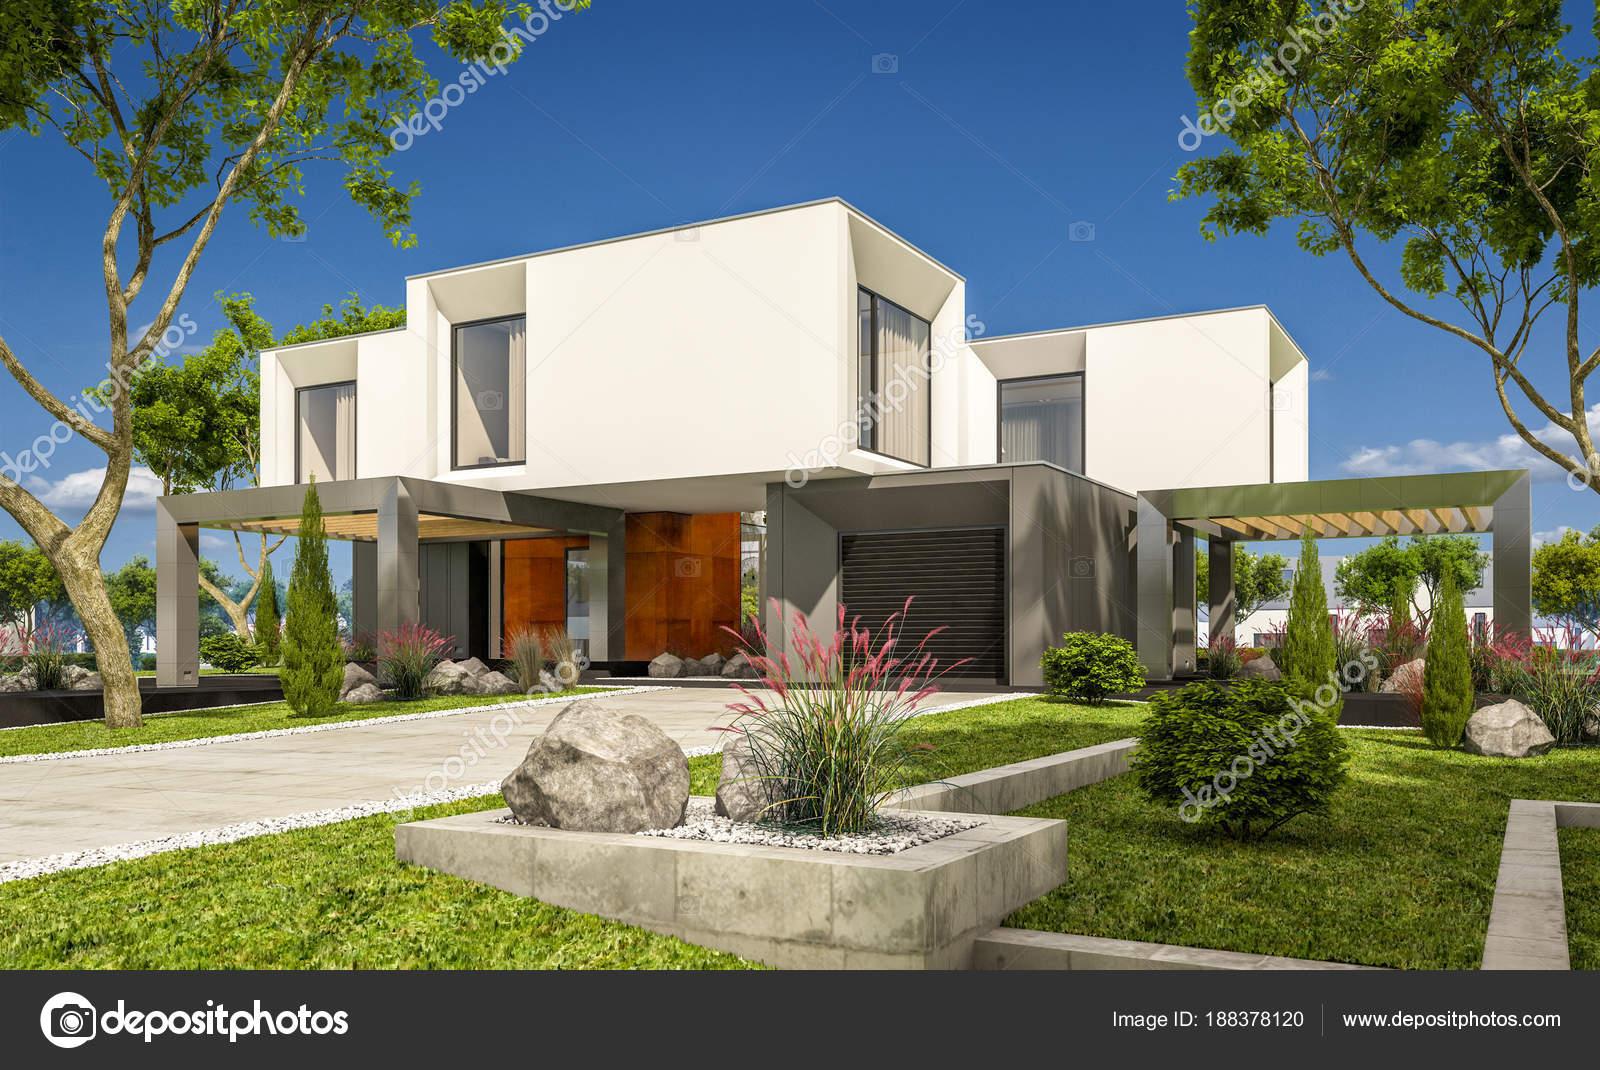 jardin casa moderna render 3d de una casa moderna en el